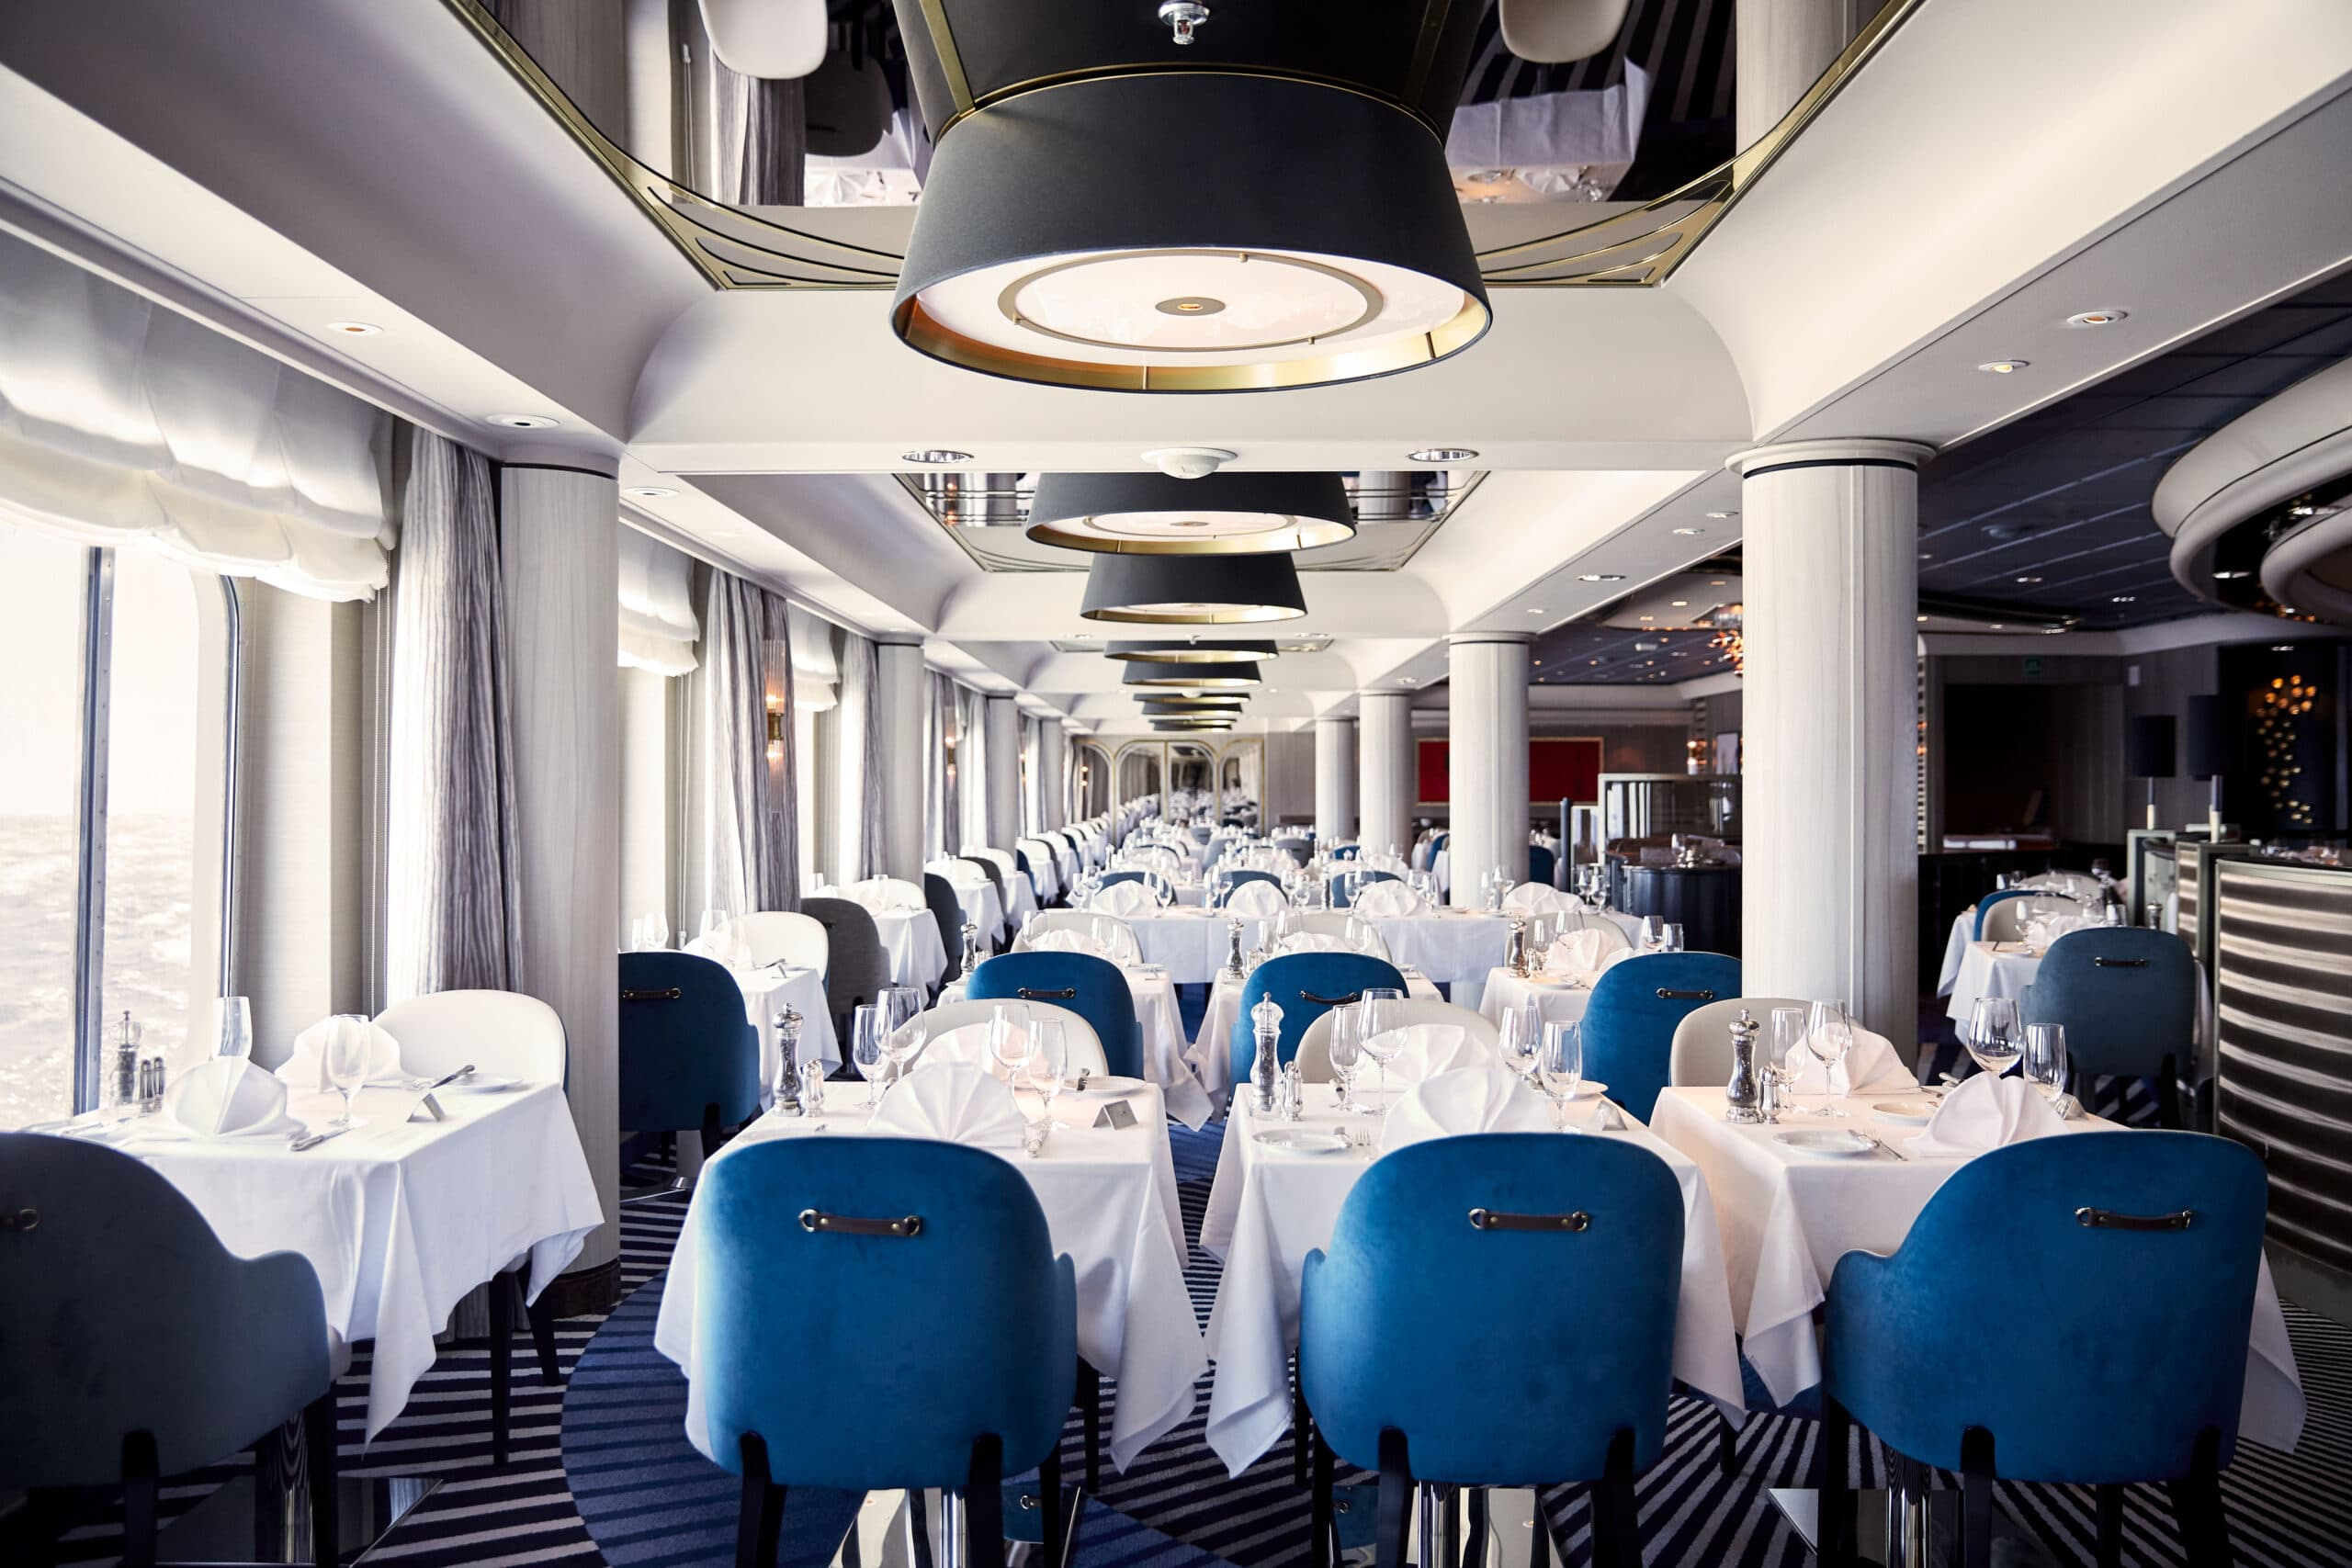 Cruiseschip-Crystal Symphony-Crystal Cruises-Restaurant Waterside